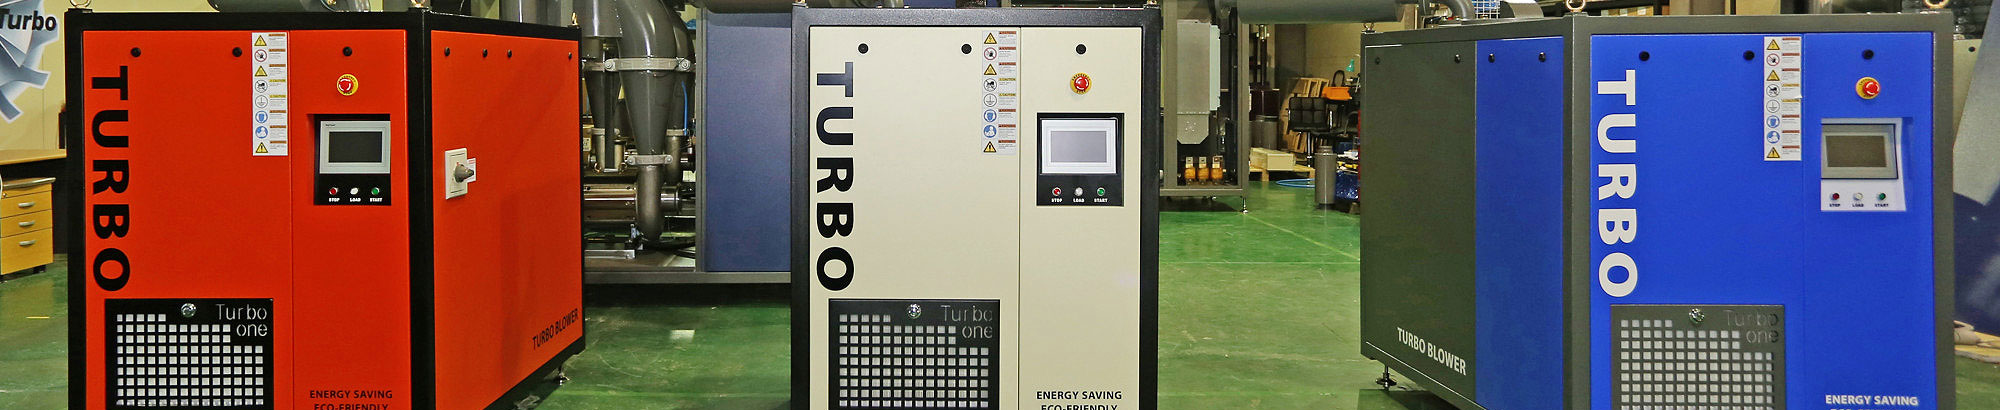 turbo banner